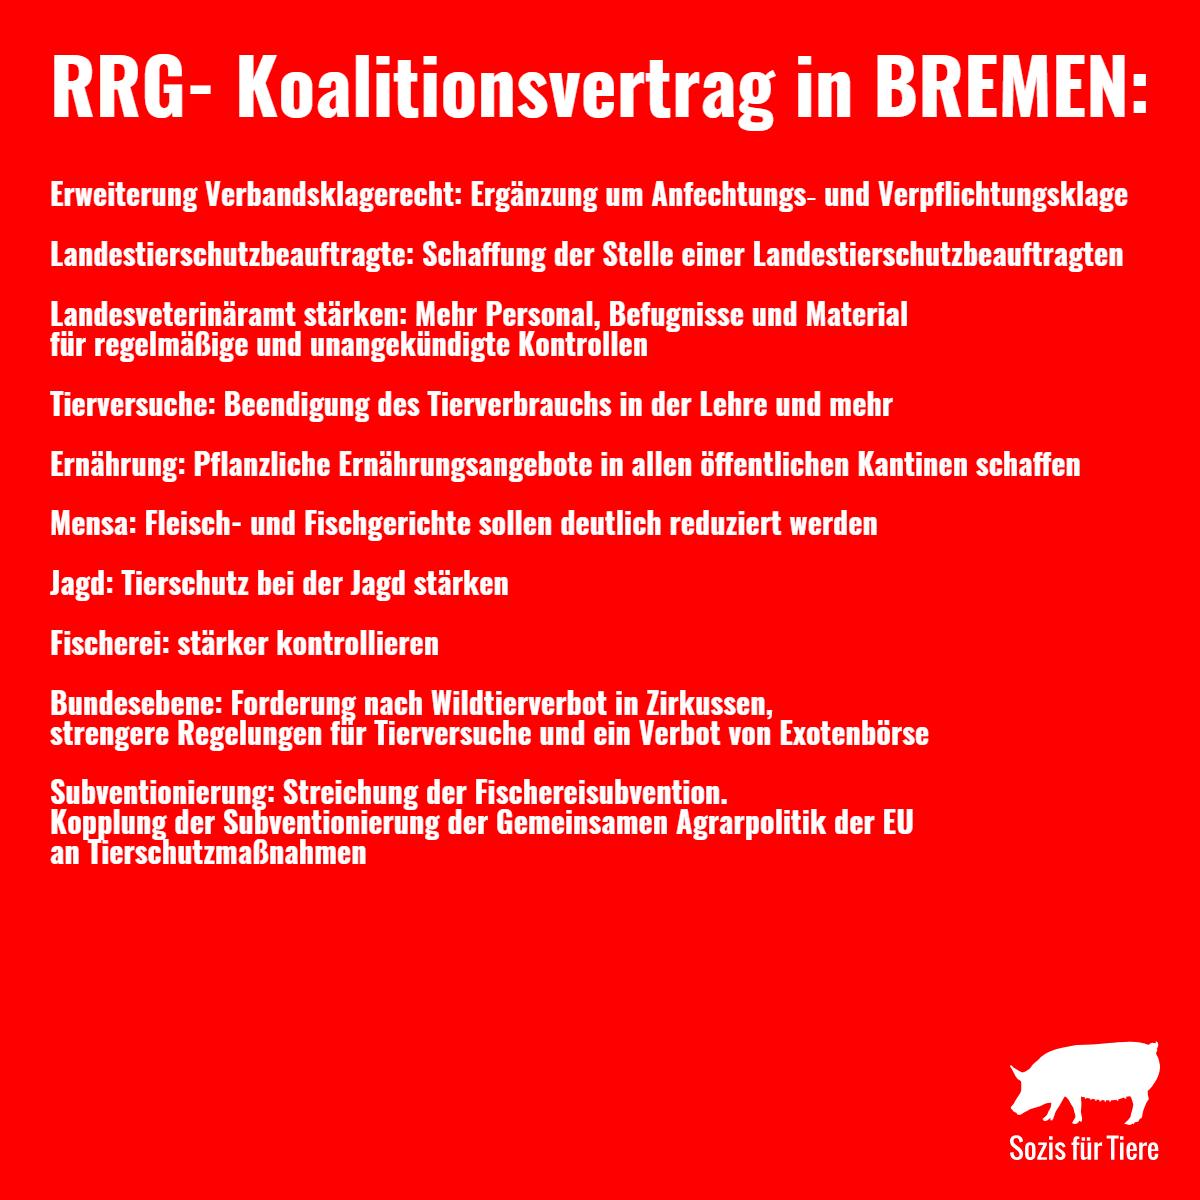 RRG-Bremen